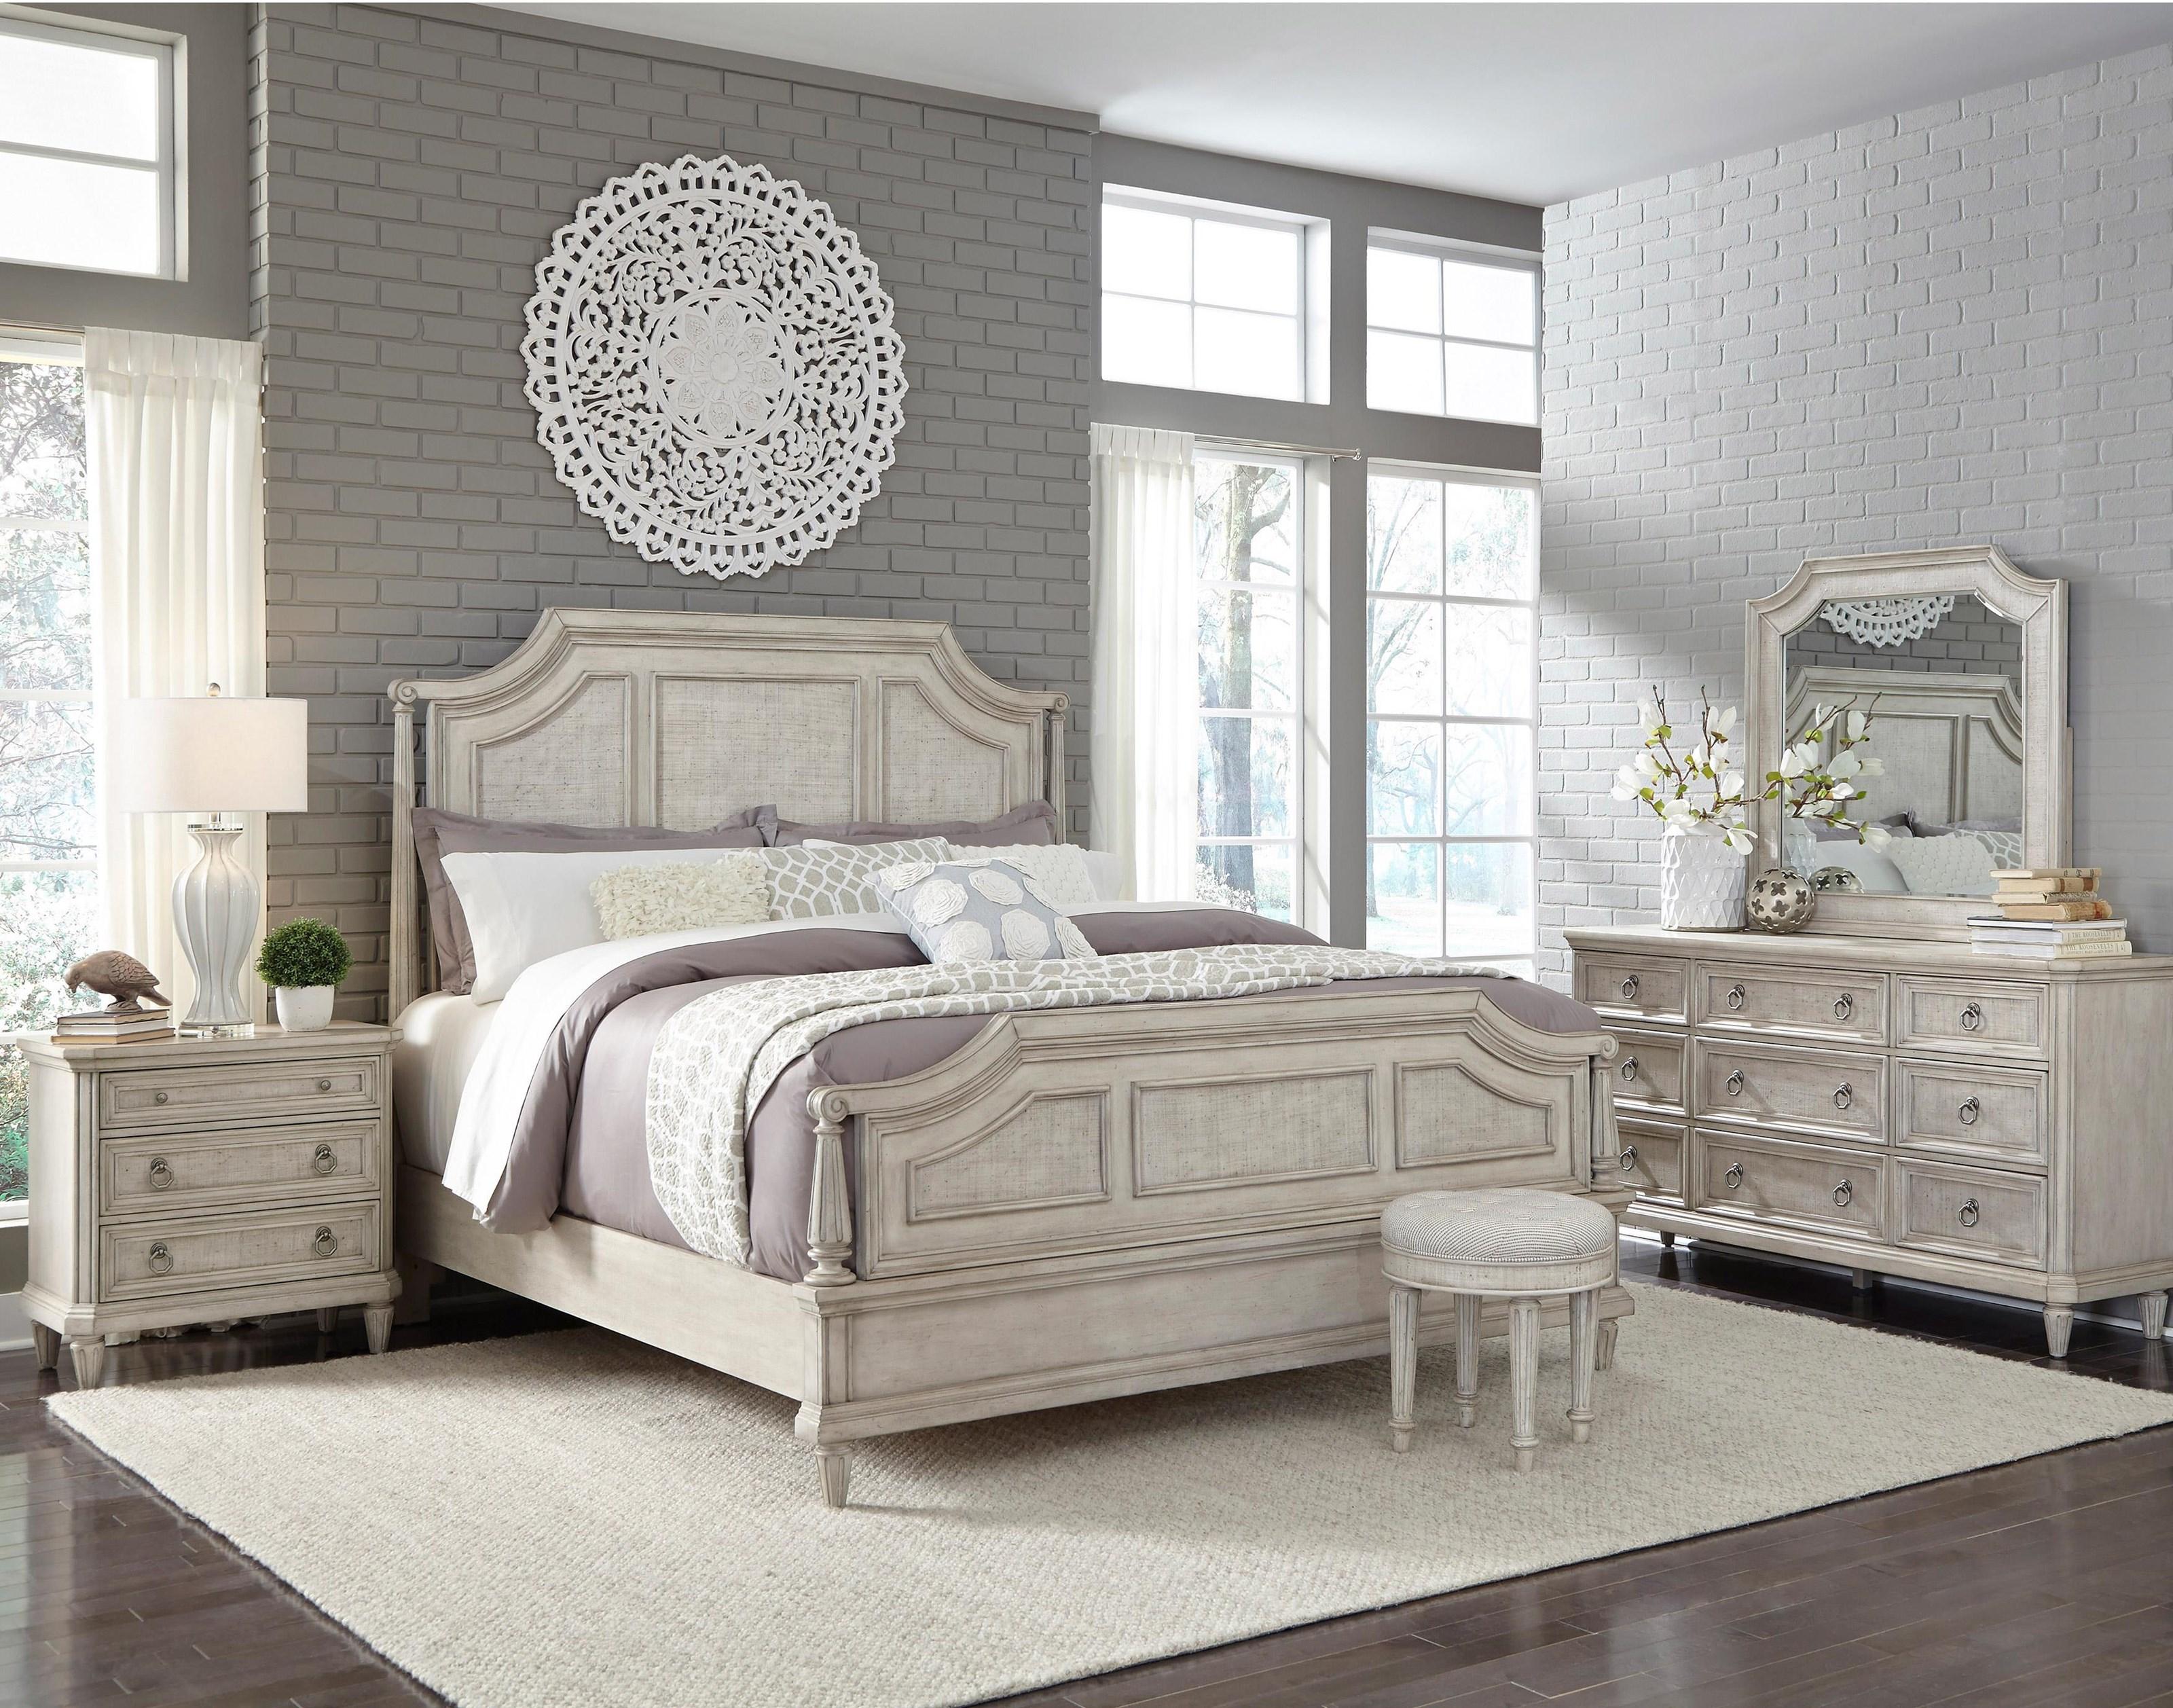 Pulaski Furniture Campbell Street King Bed, Dresser, Mirror, and Nightstand wi - Item Number: GRP-P1231XX-KINGSUITE